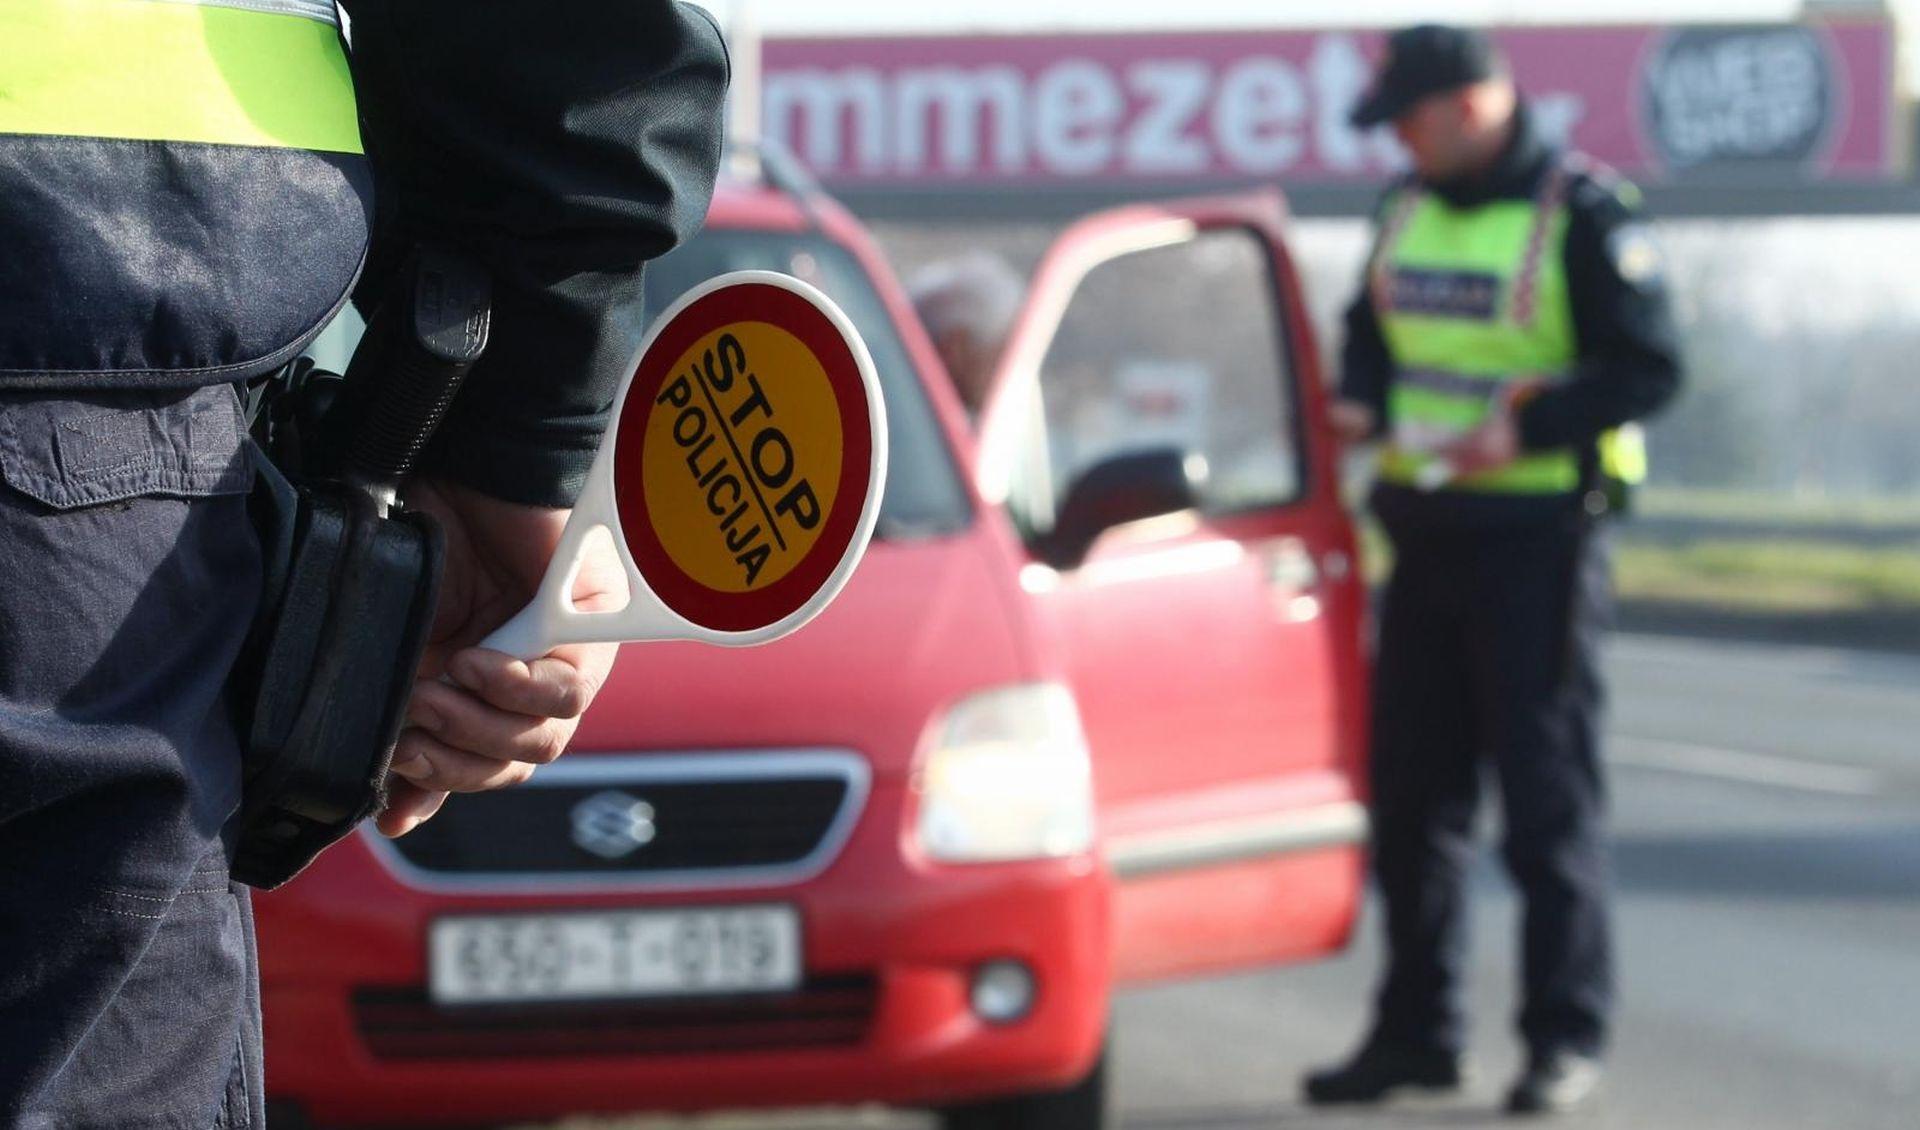 ZAGREB Vozači, oprez! Policija najavila veliku akciju